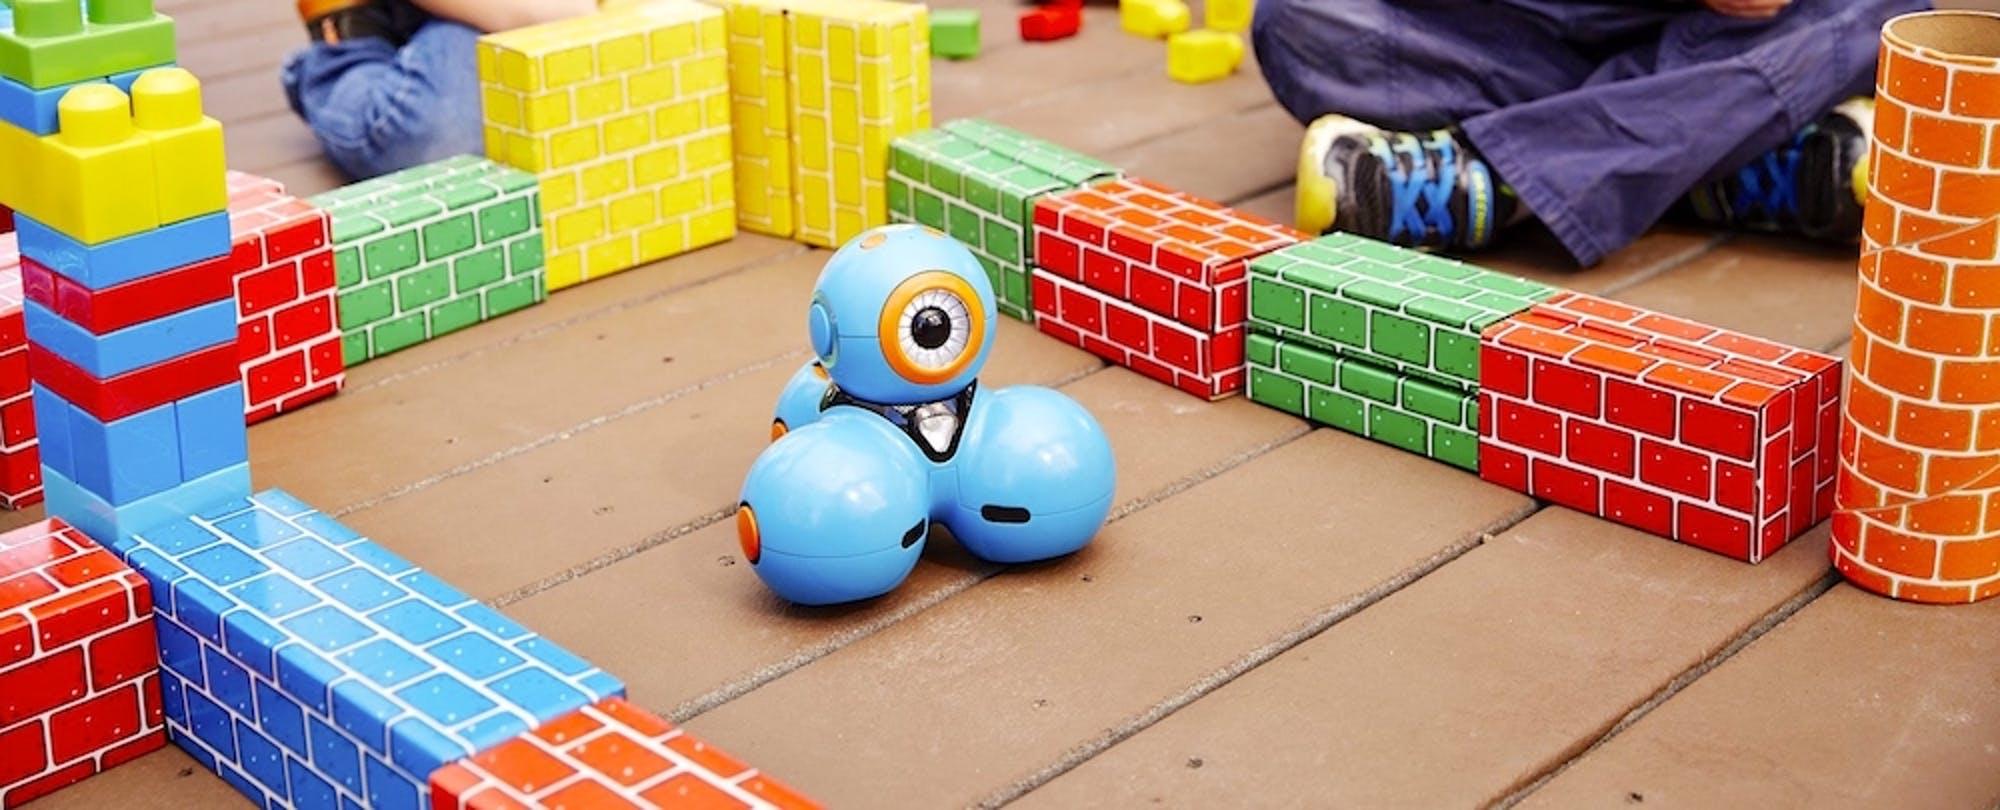 Robot Maker Wonder Workshop Raises a $20M Series B to Expand Internationally